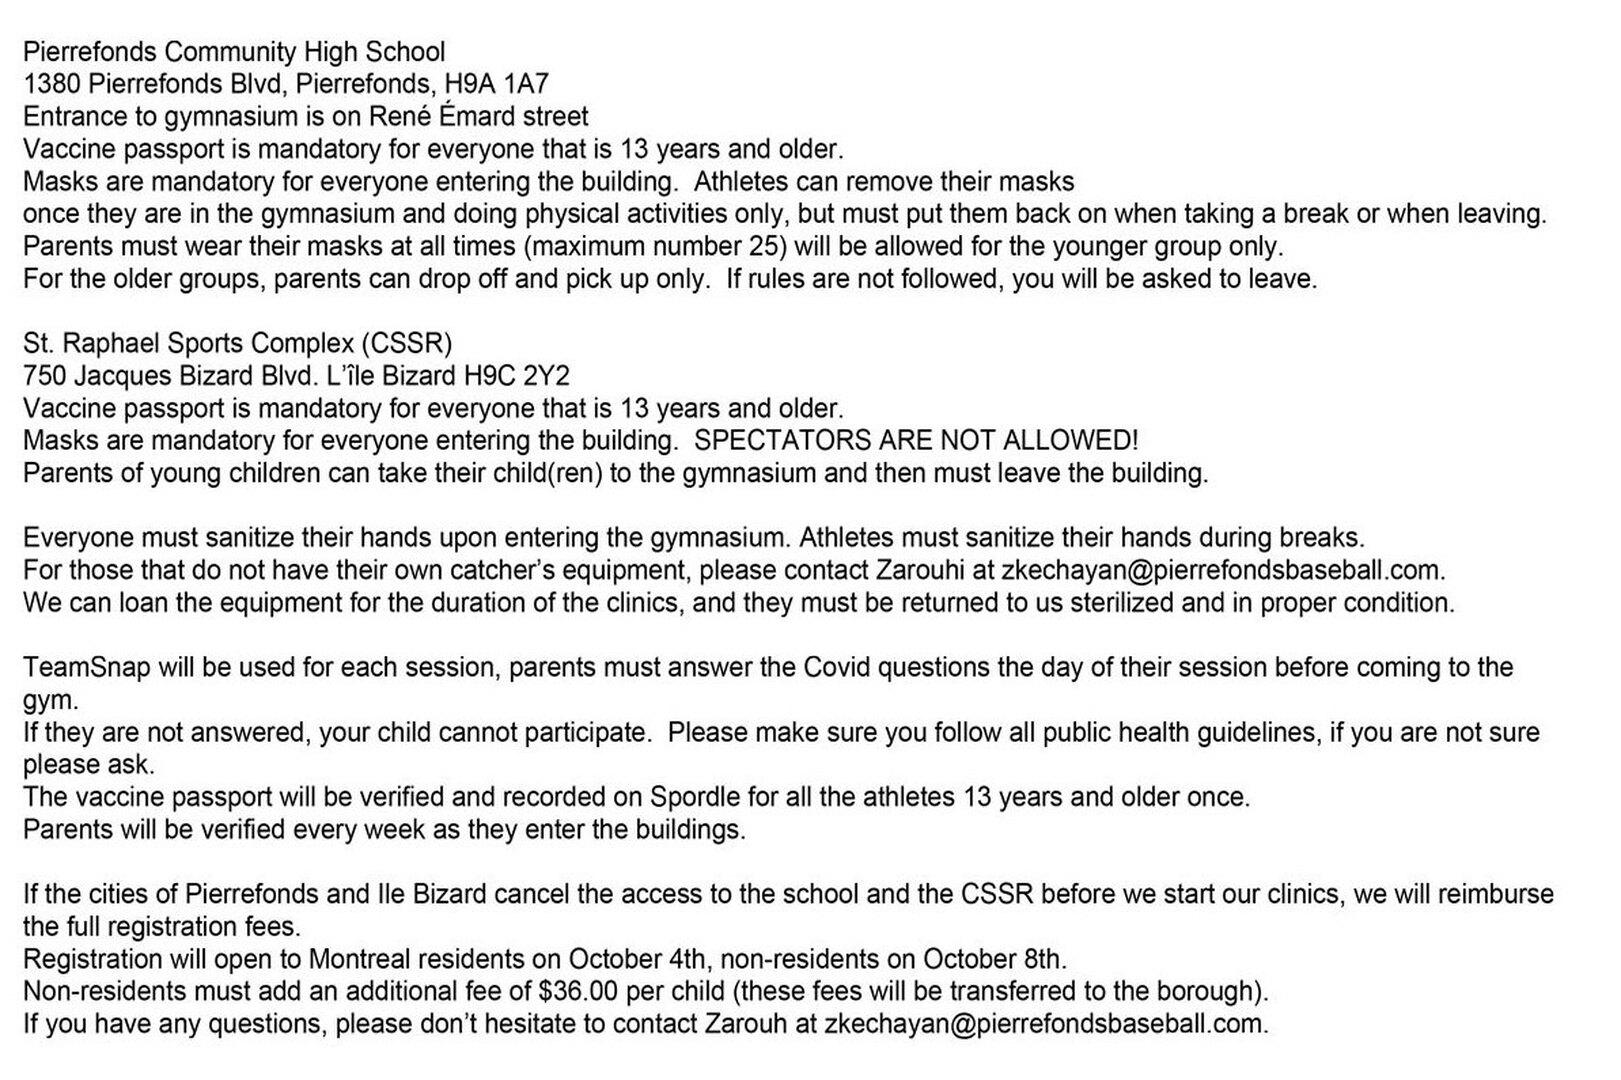 Fall Clinic Covid Rules